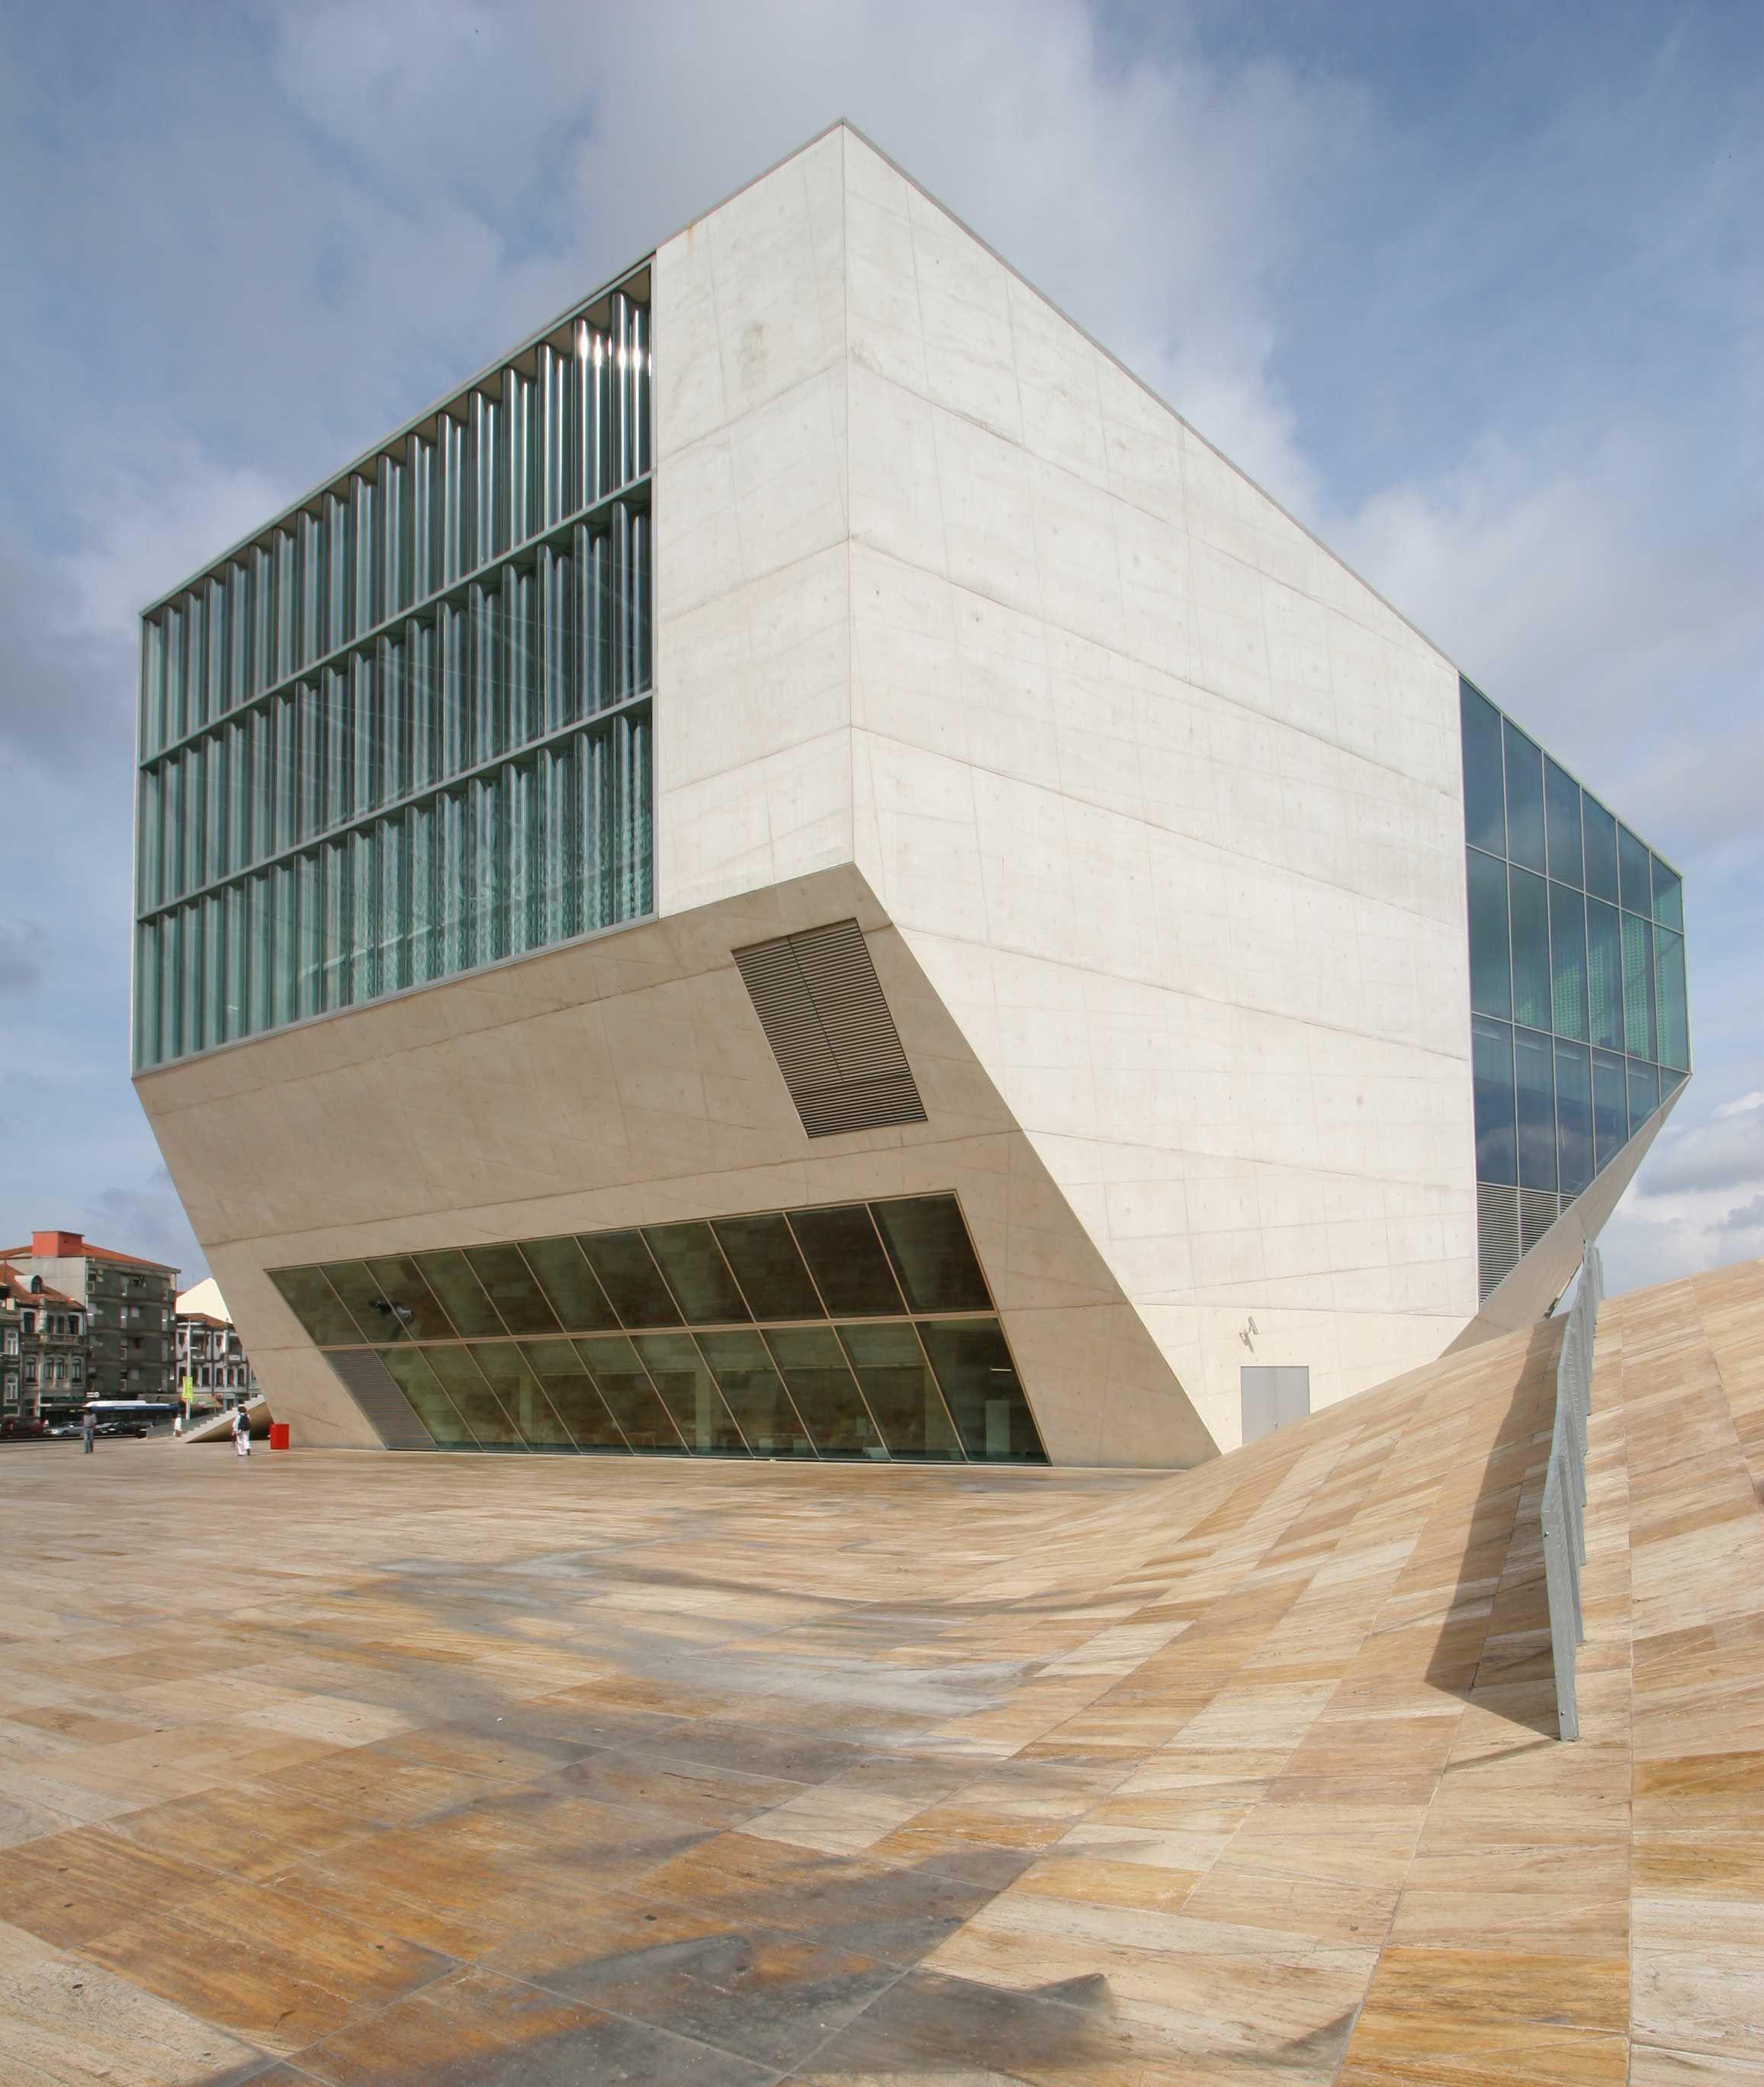 rem koolhaas casa da musica (details) minimal